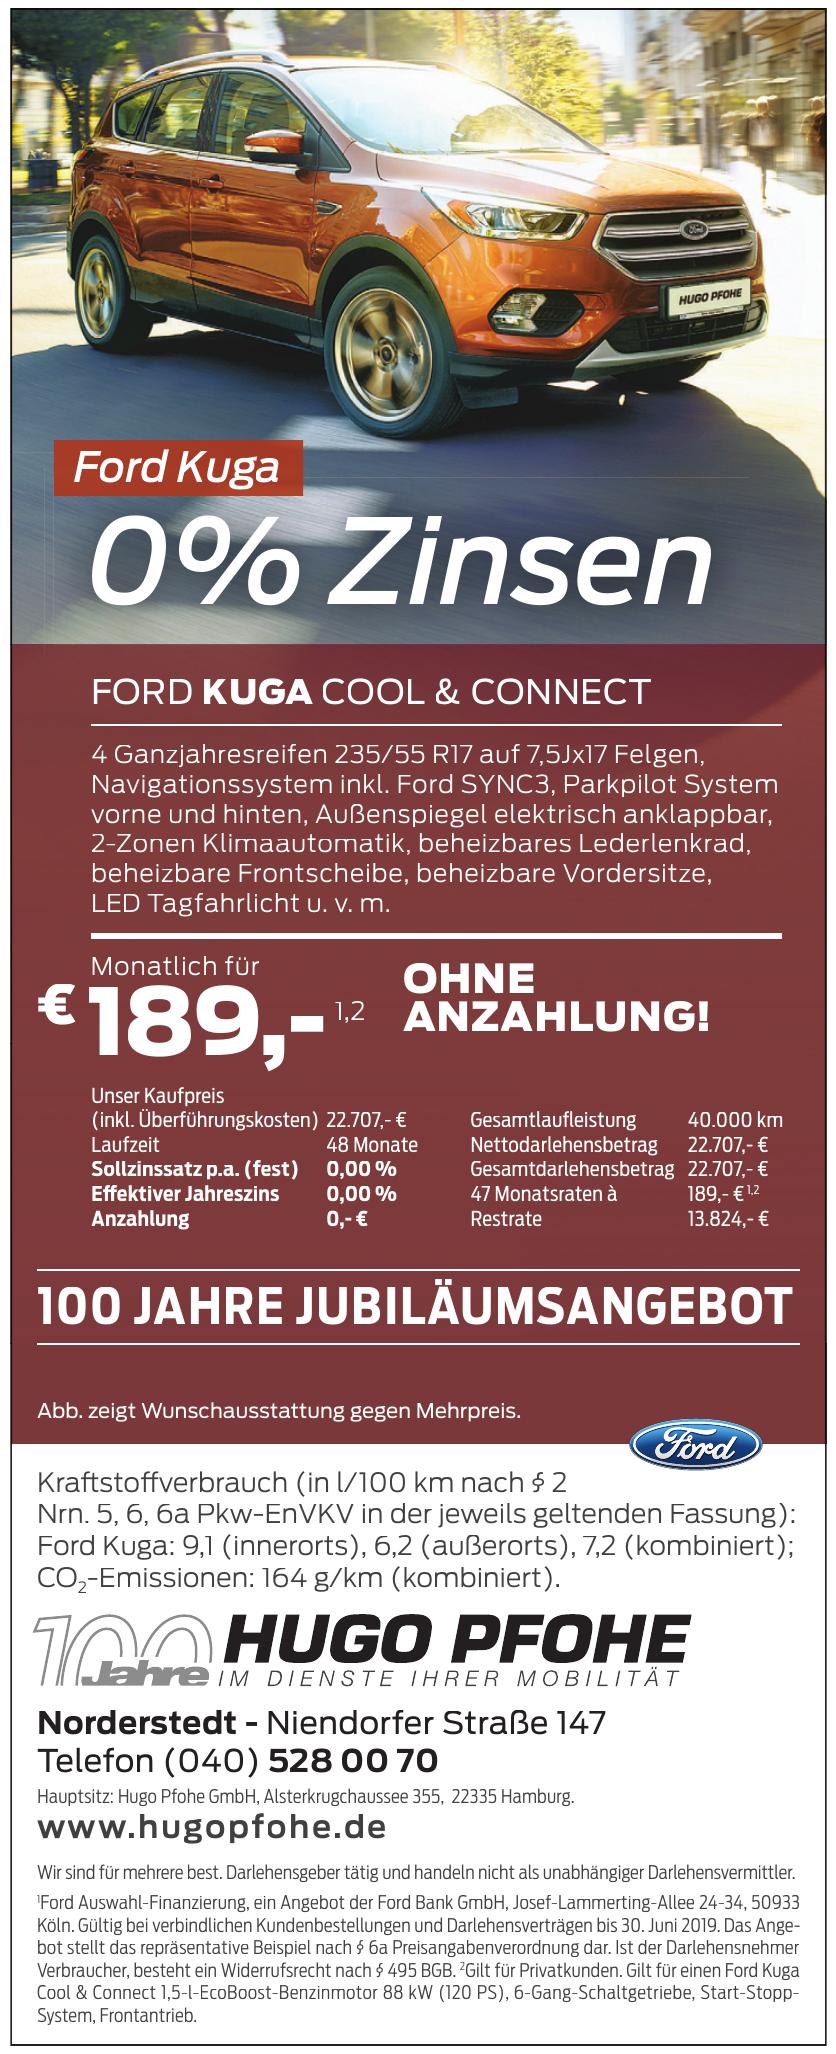 Hugo Pfohe GmbH